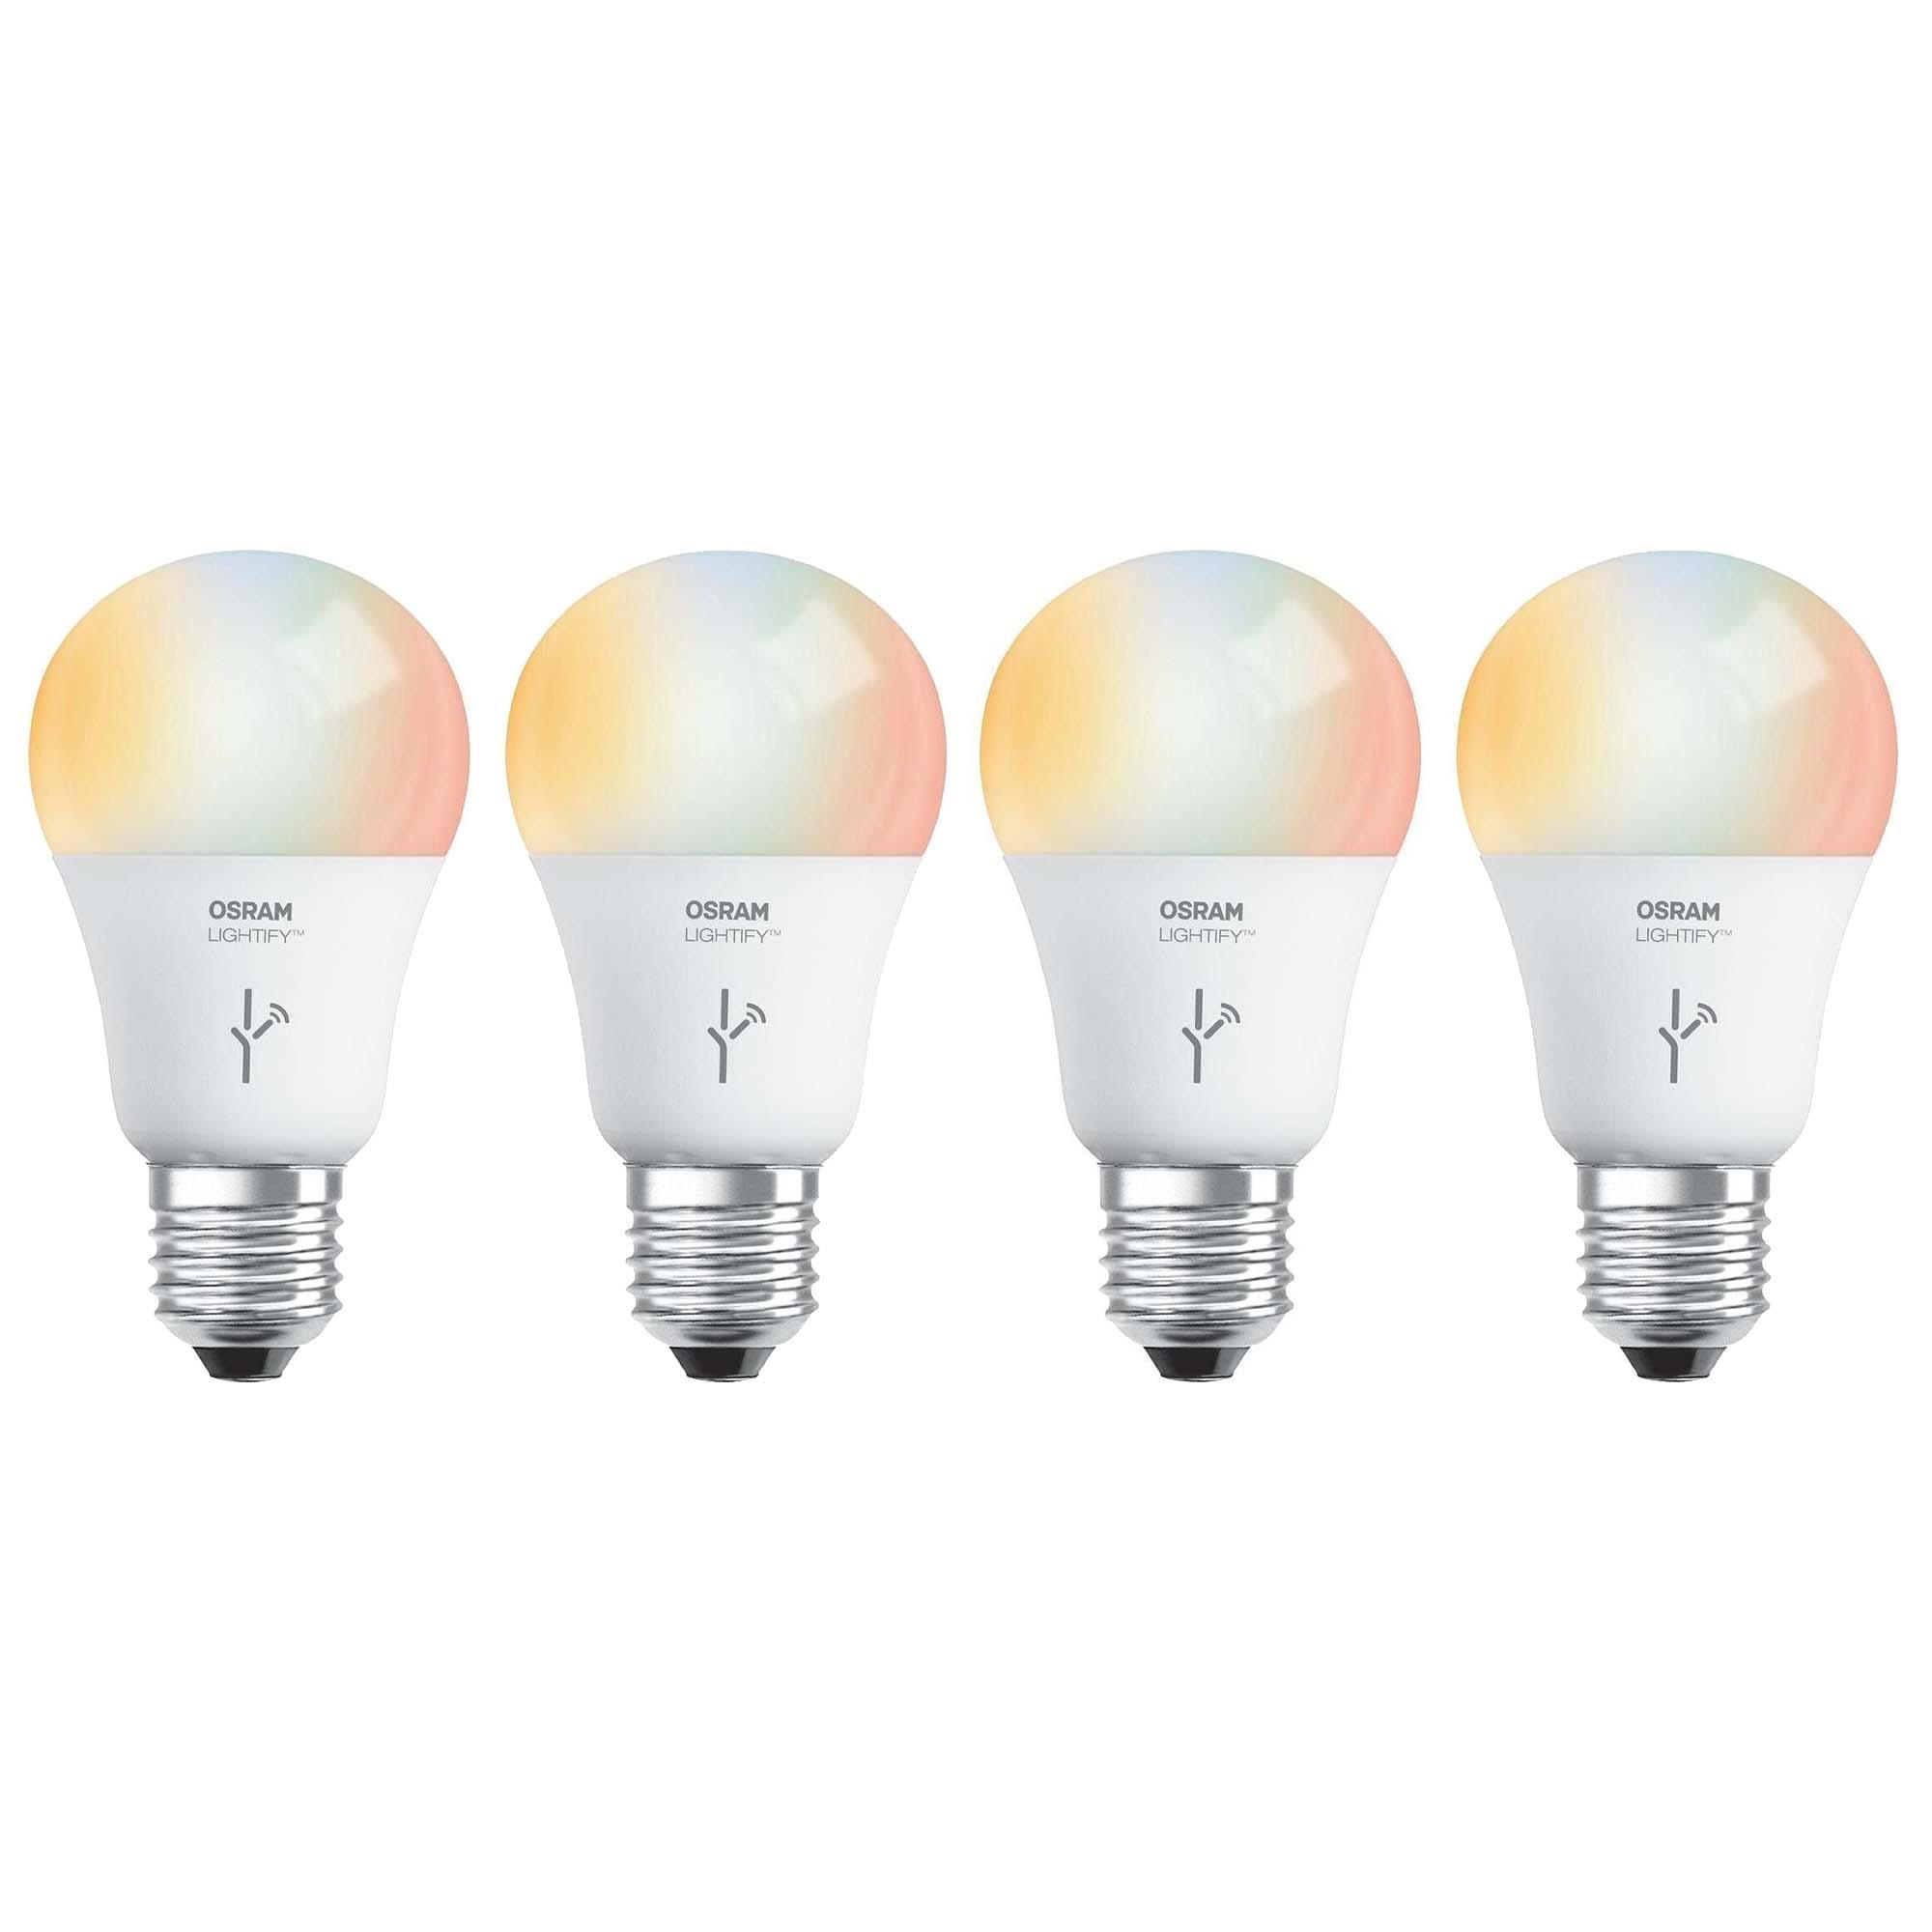 Sylvania Osram Lightify 60w A19 Daylight Rgb Smart Led Light Bulb 4 Pack